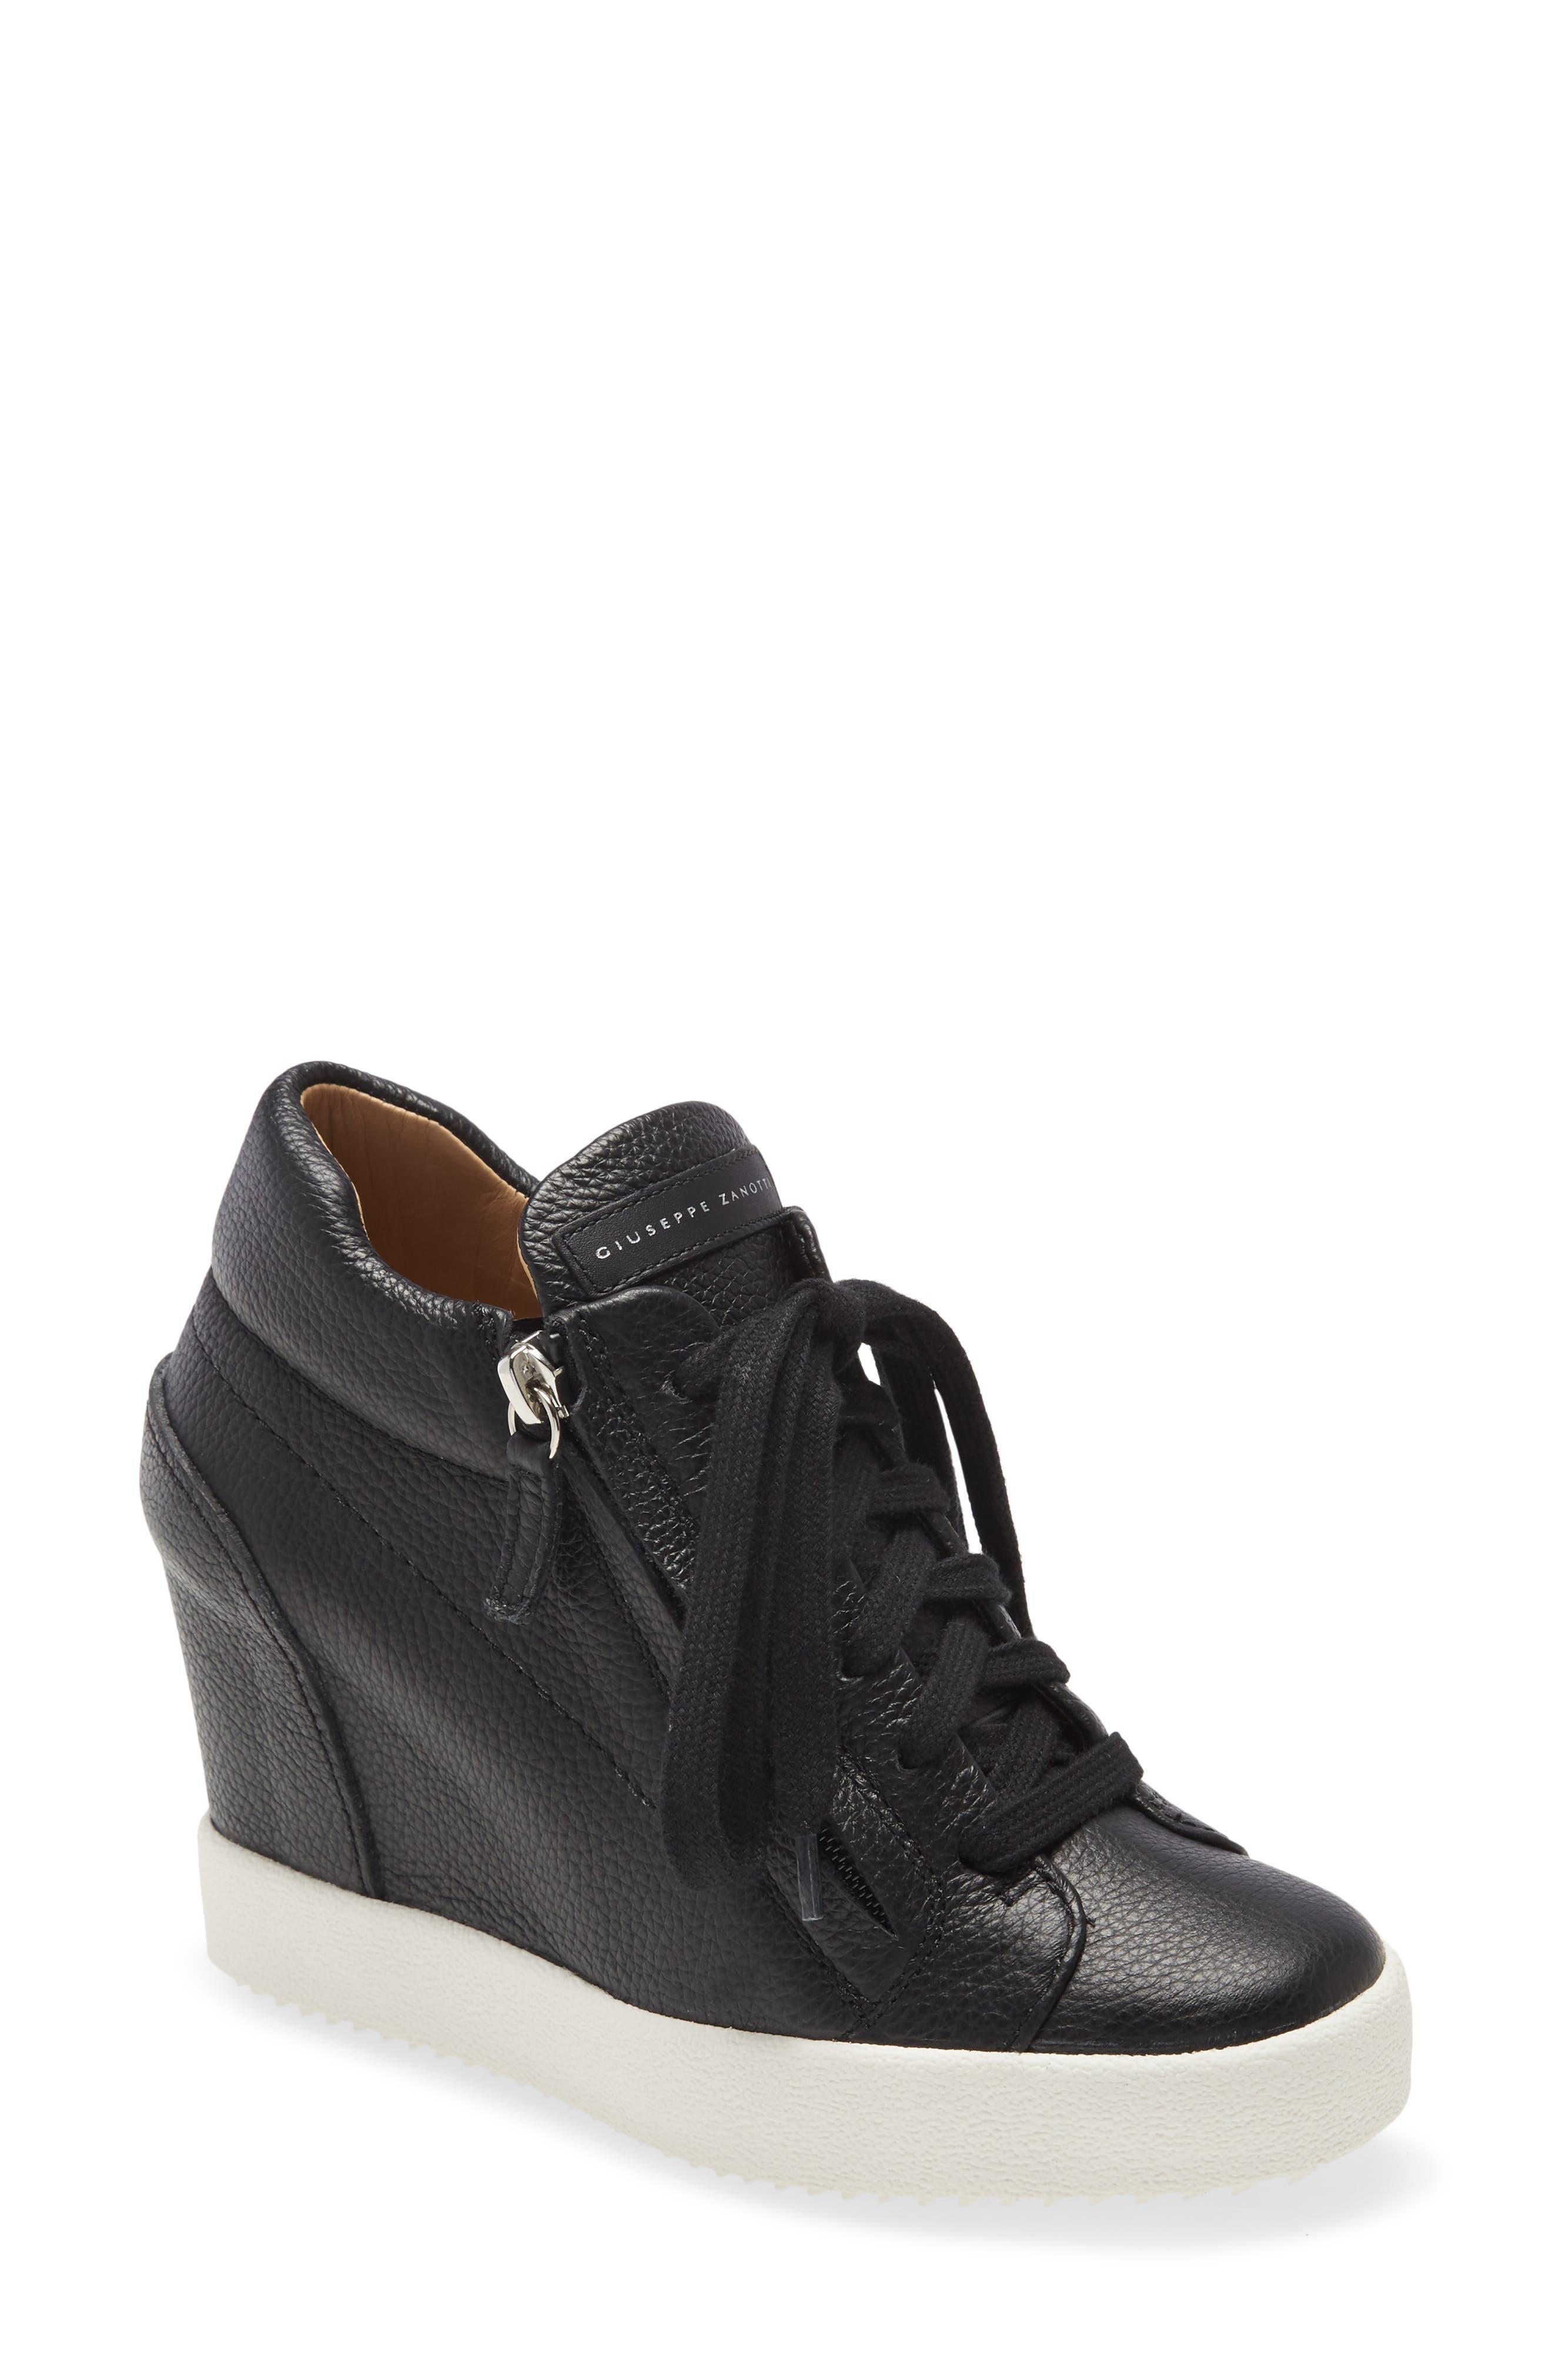 Giuseppe Zanotti High Top Wedge Sneaker